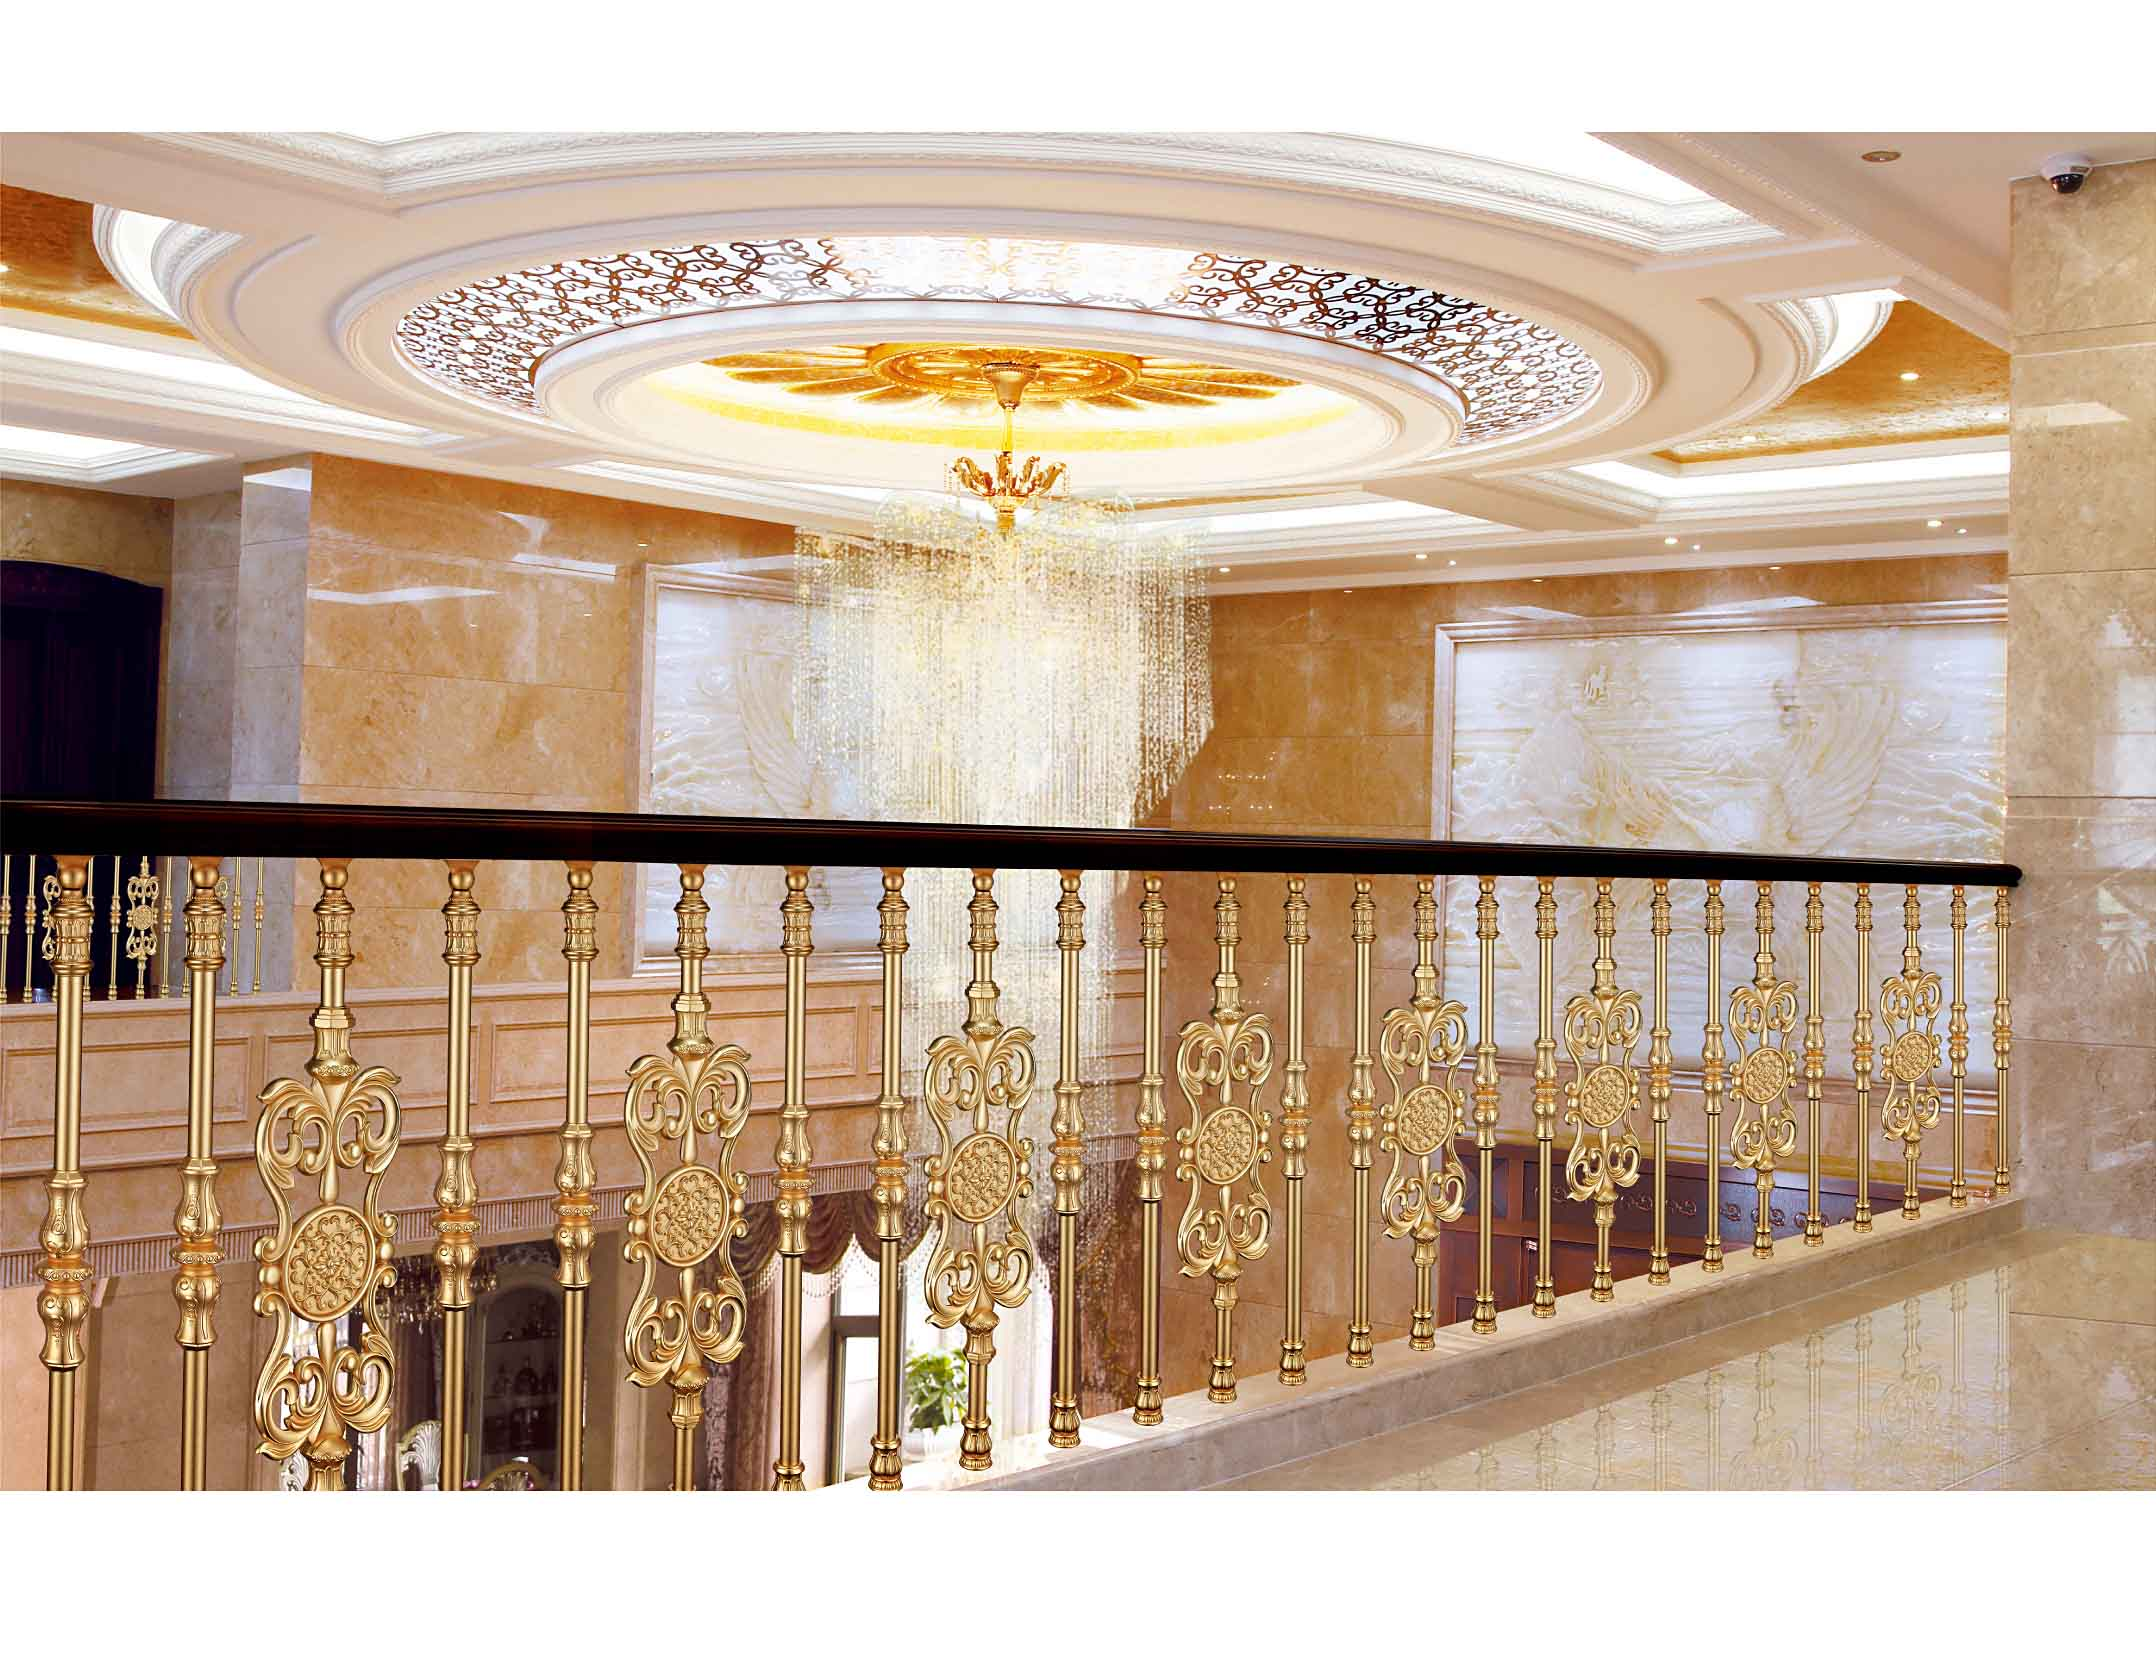 B002翡翠龙湾/楼梯护栏/金属楼梯/酒店楼梯护栏